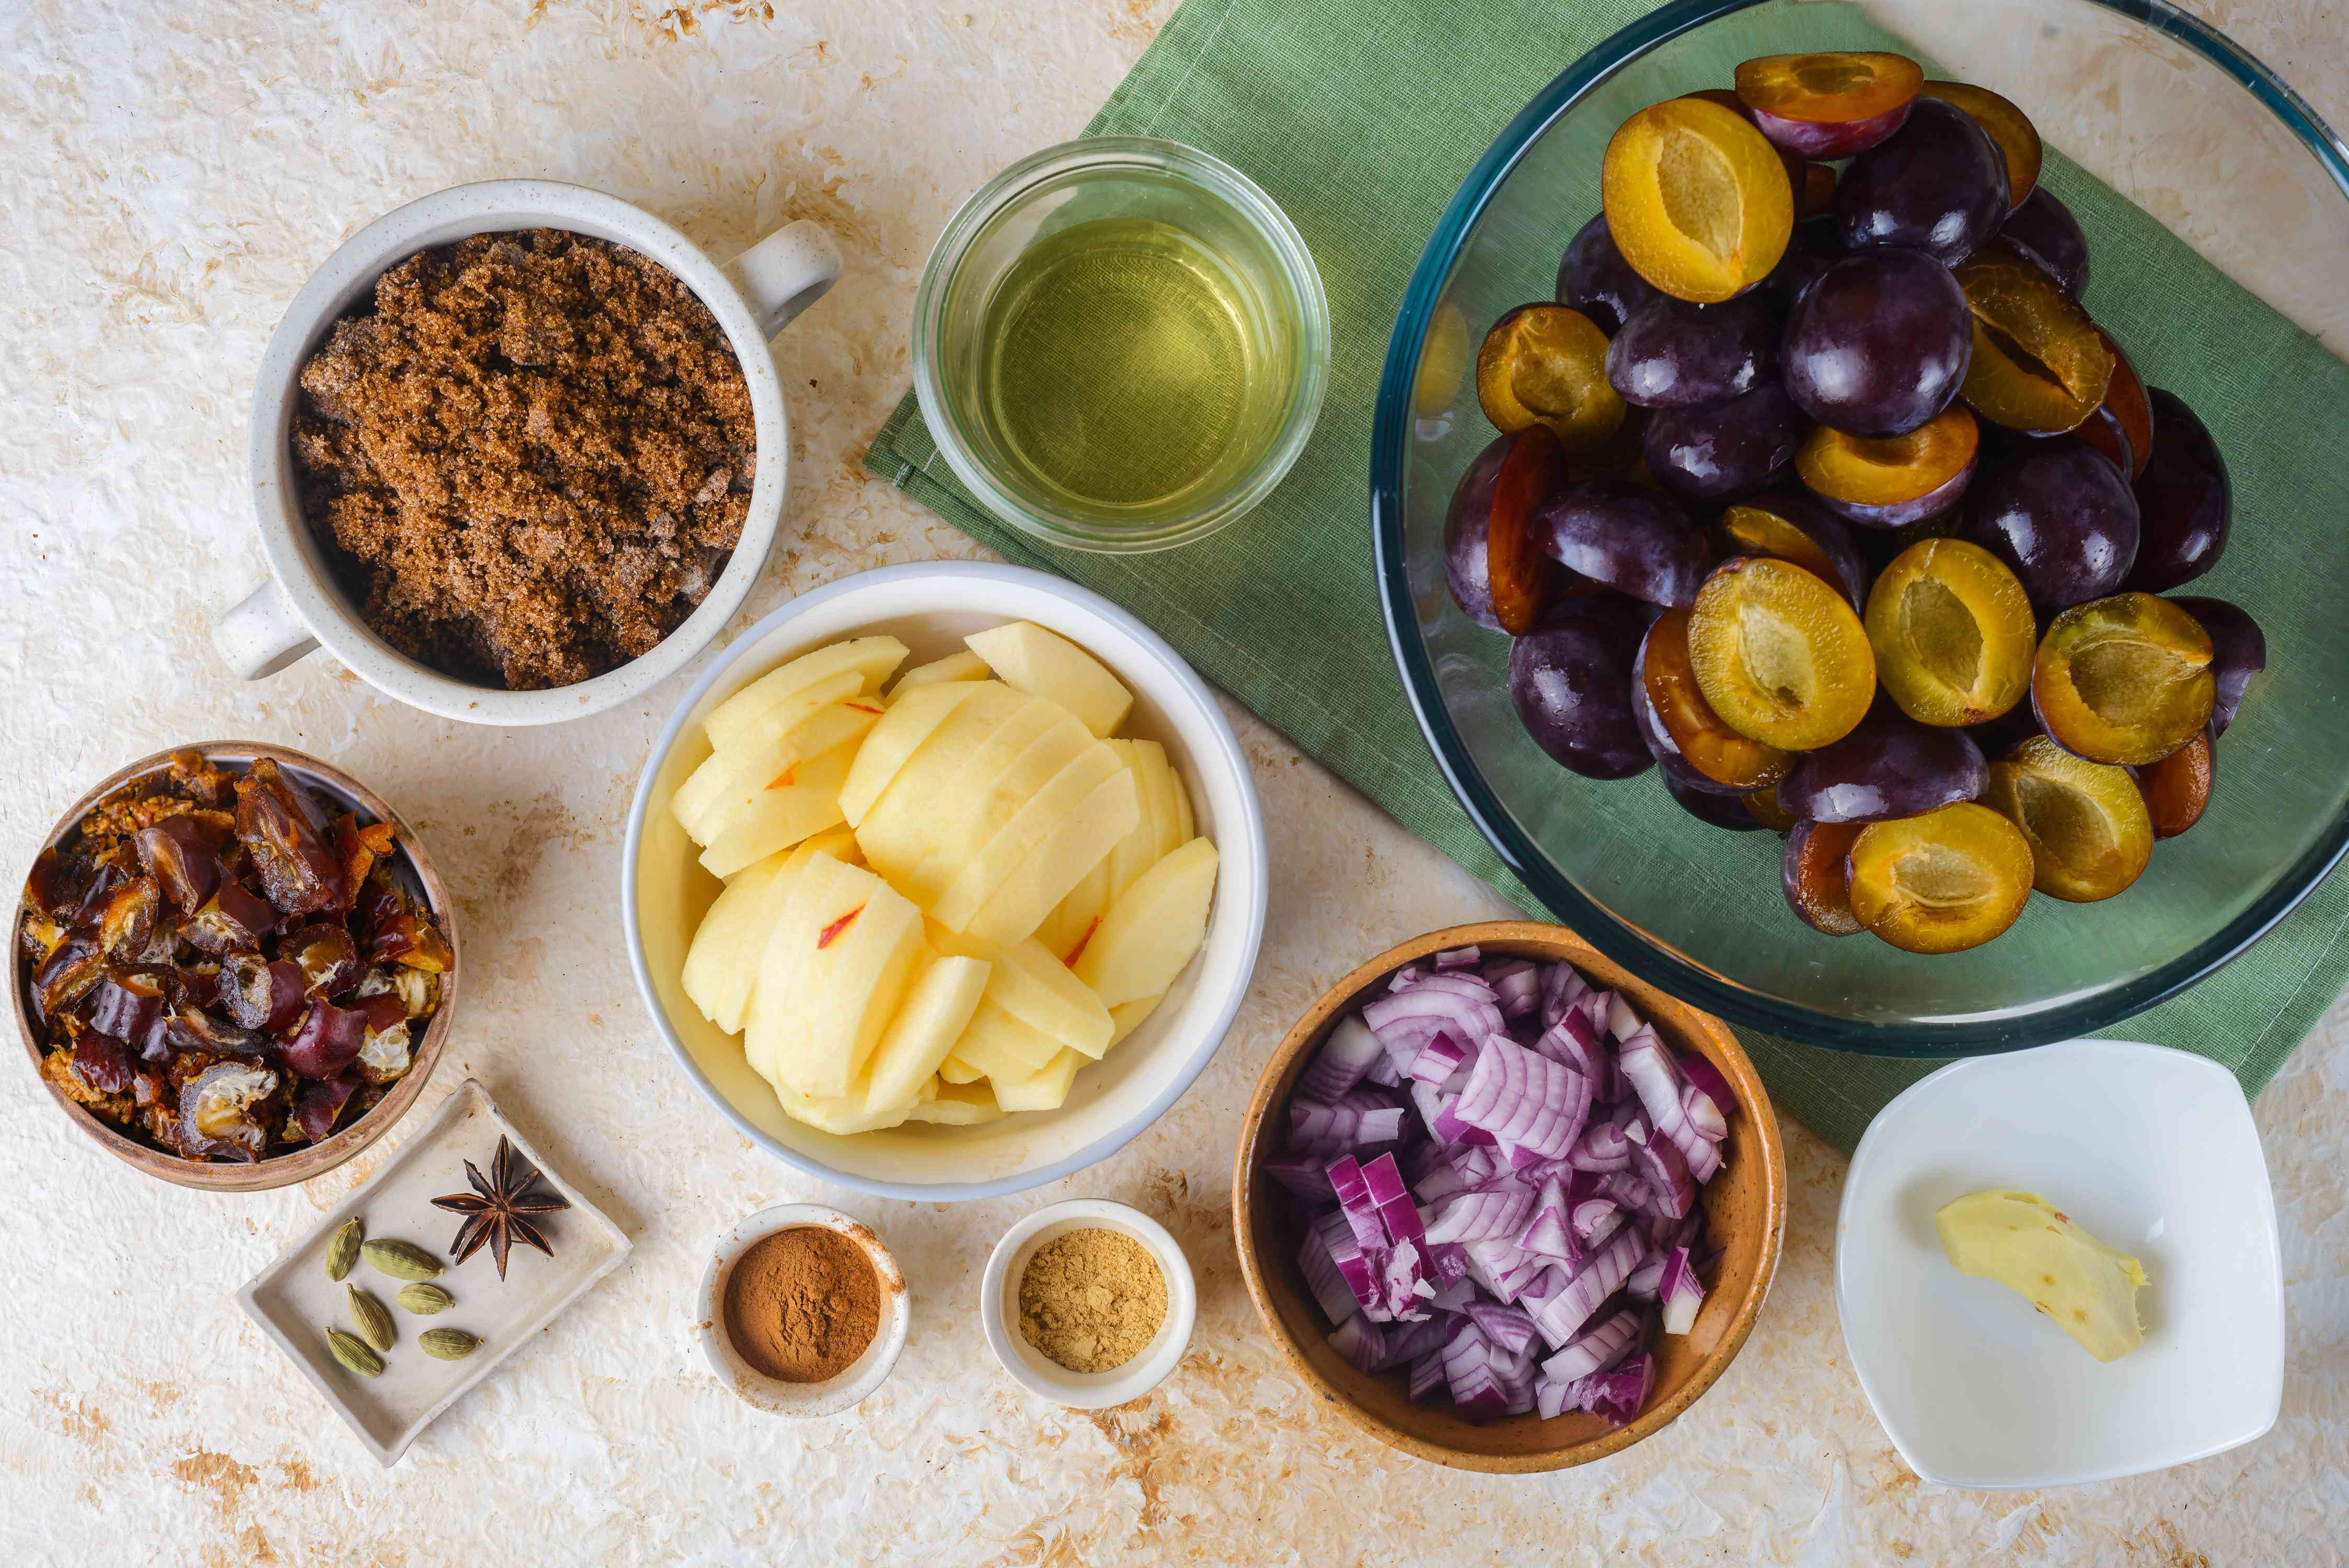 Ingredients for plum chutney